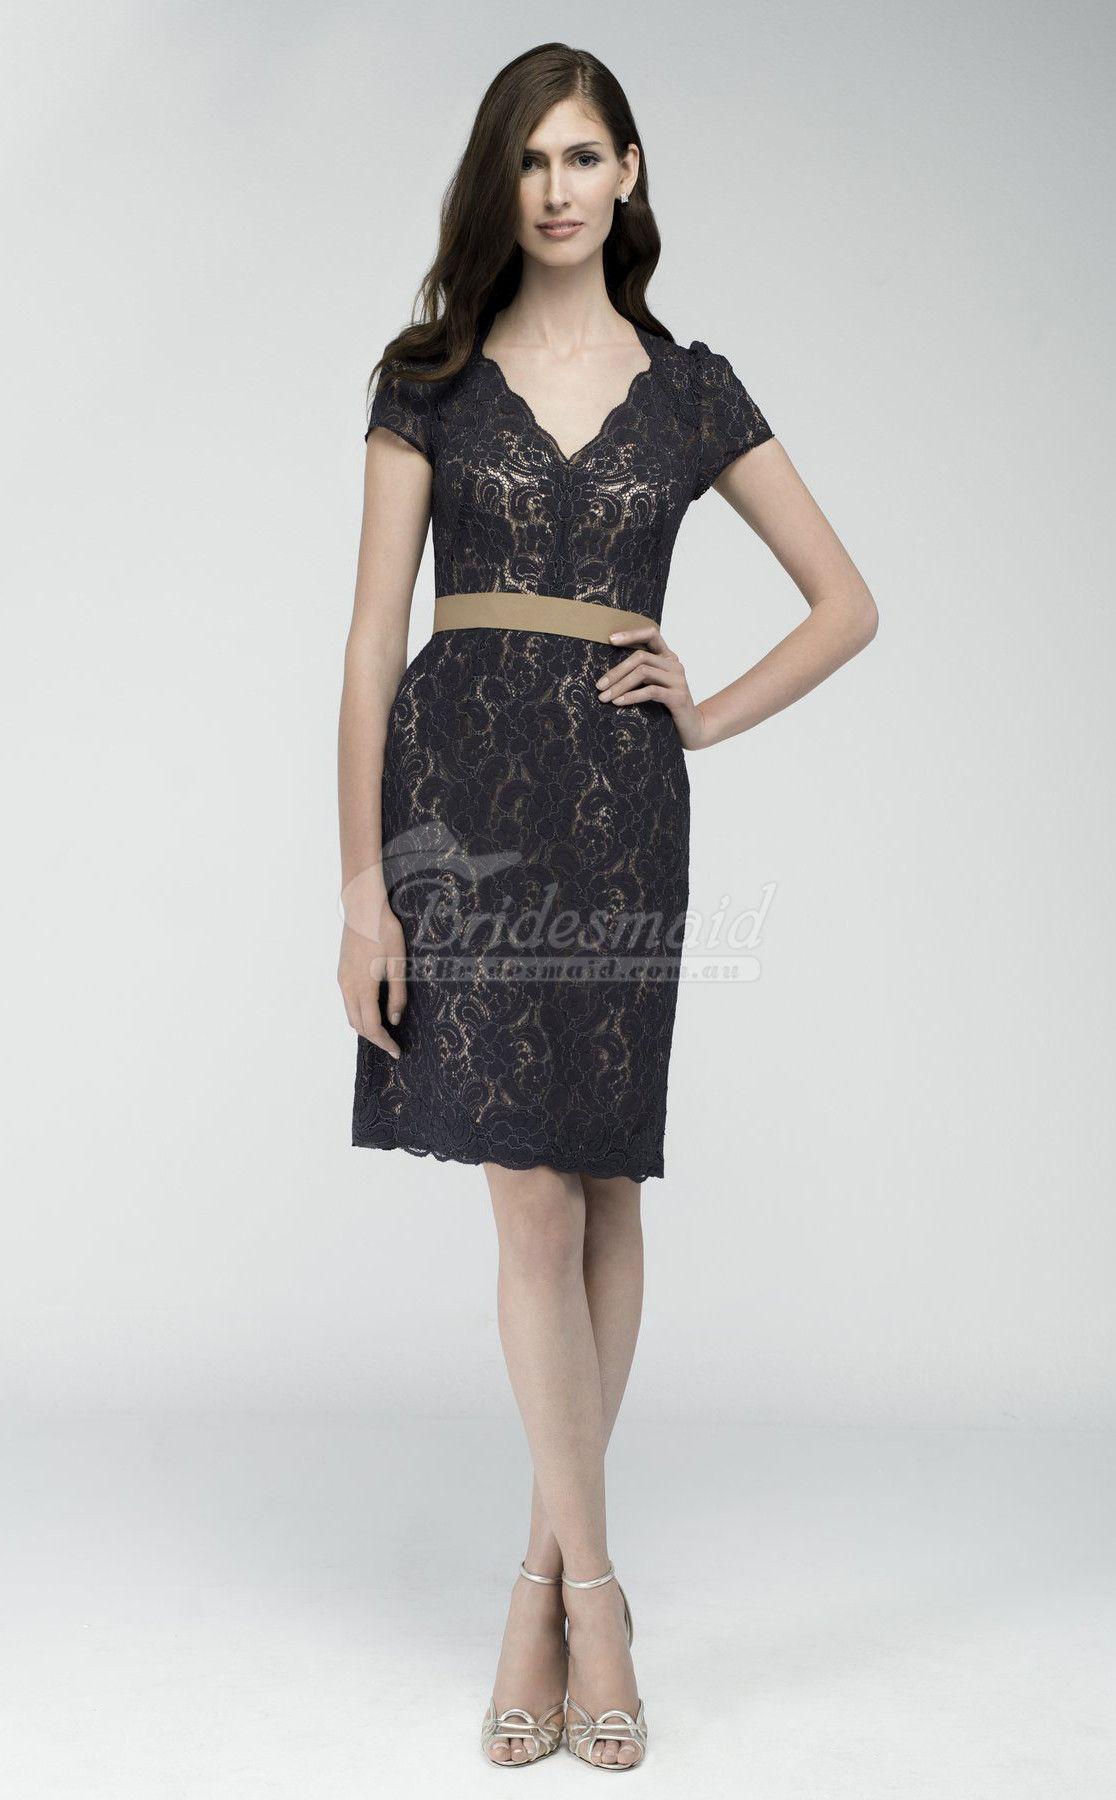 Wedding dresses for black girls  Sheath VNeck Lace Black Bridesmaid Dress with Short Sleeves